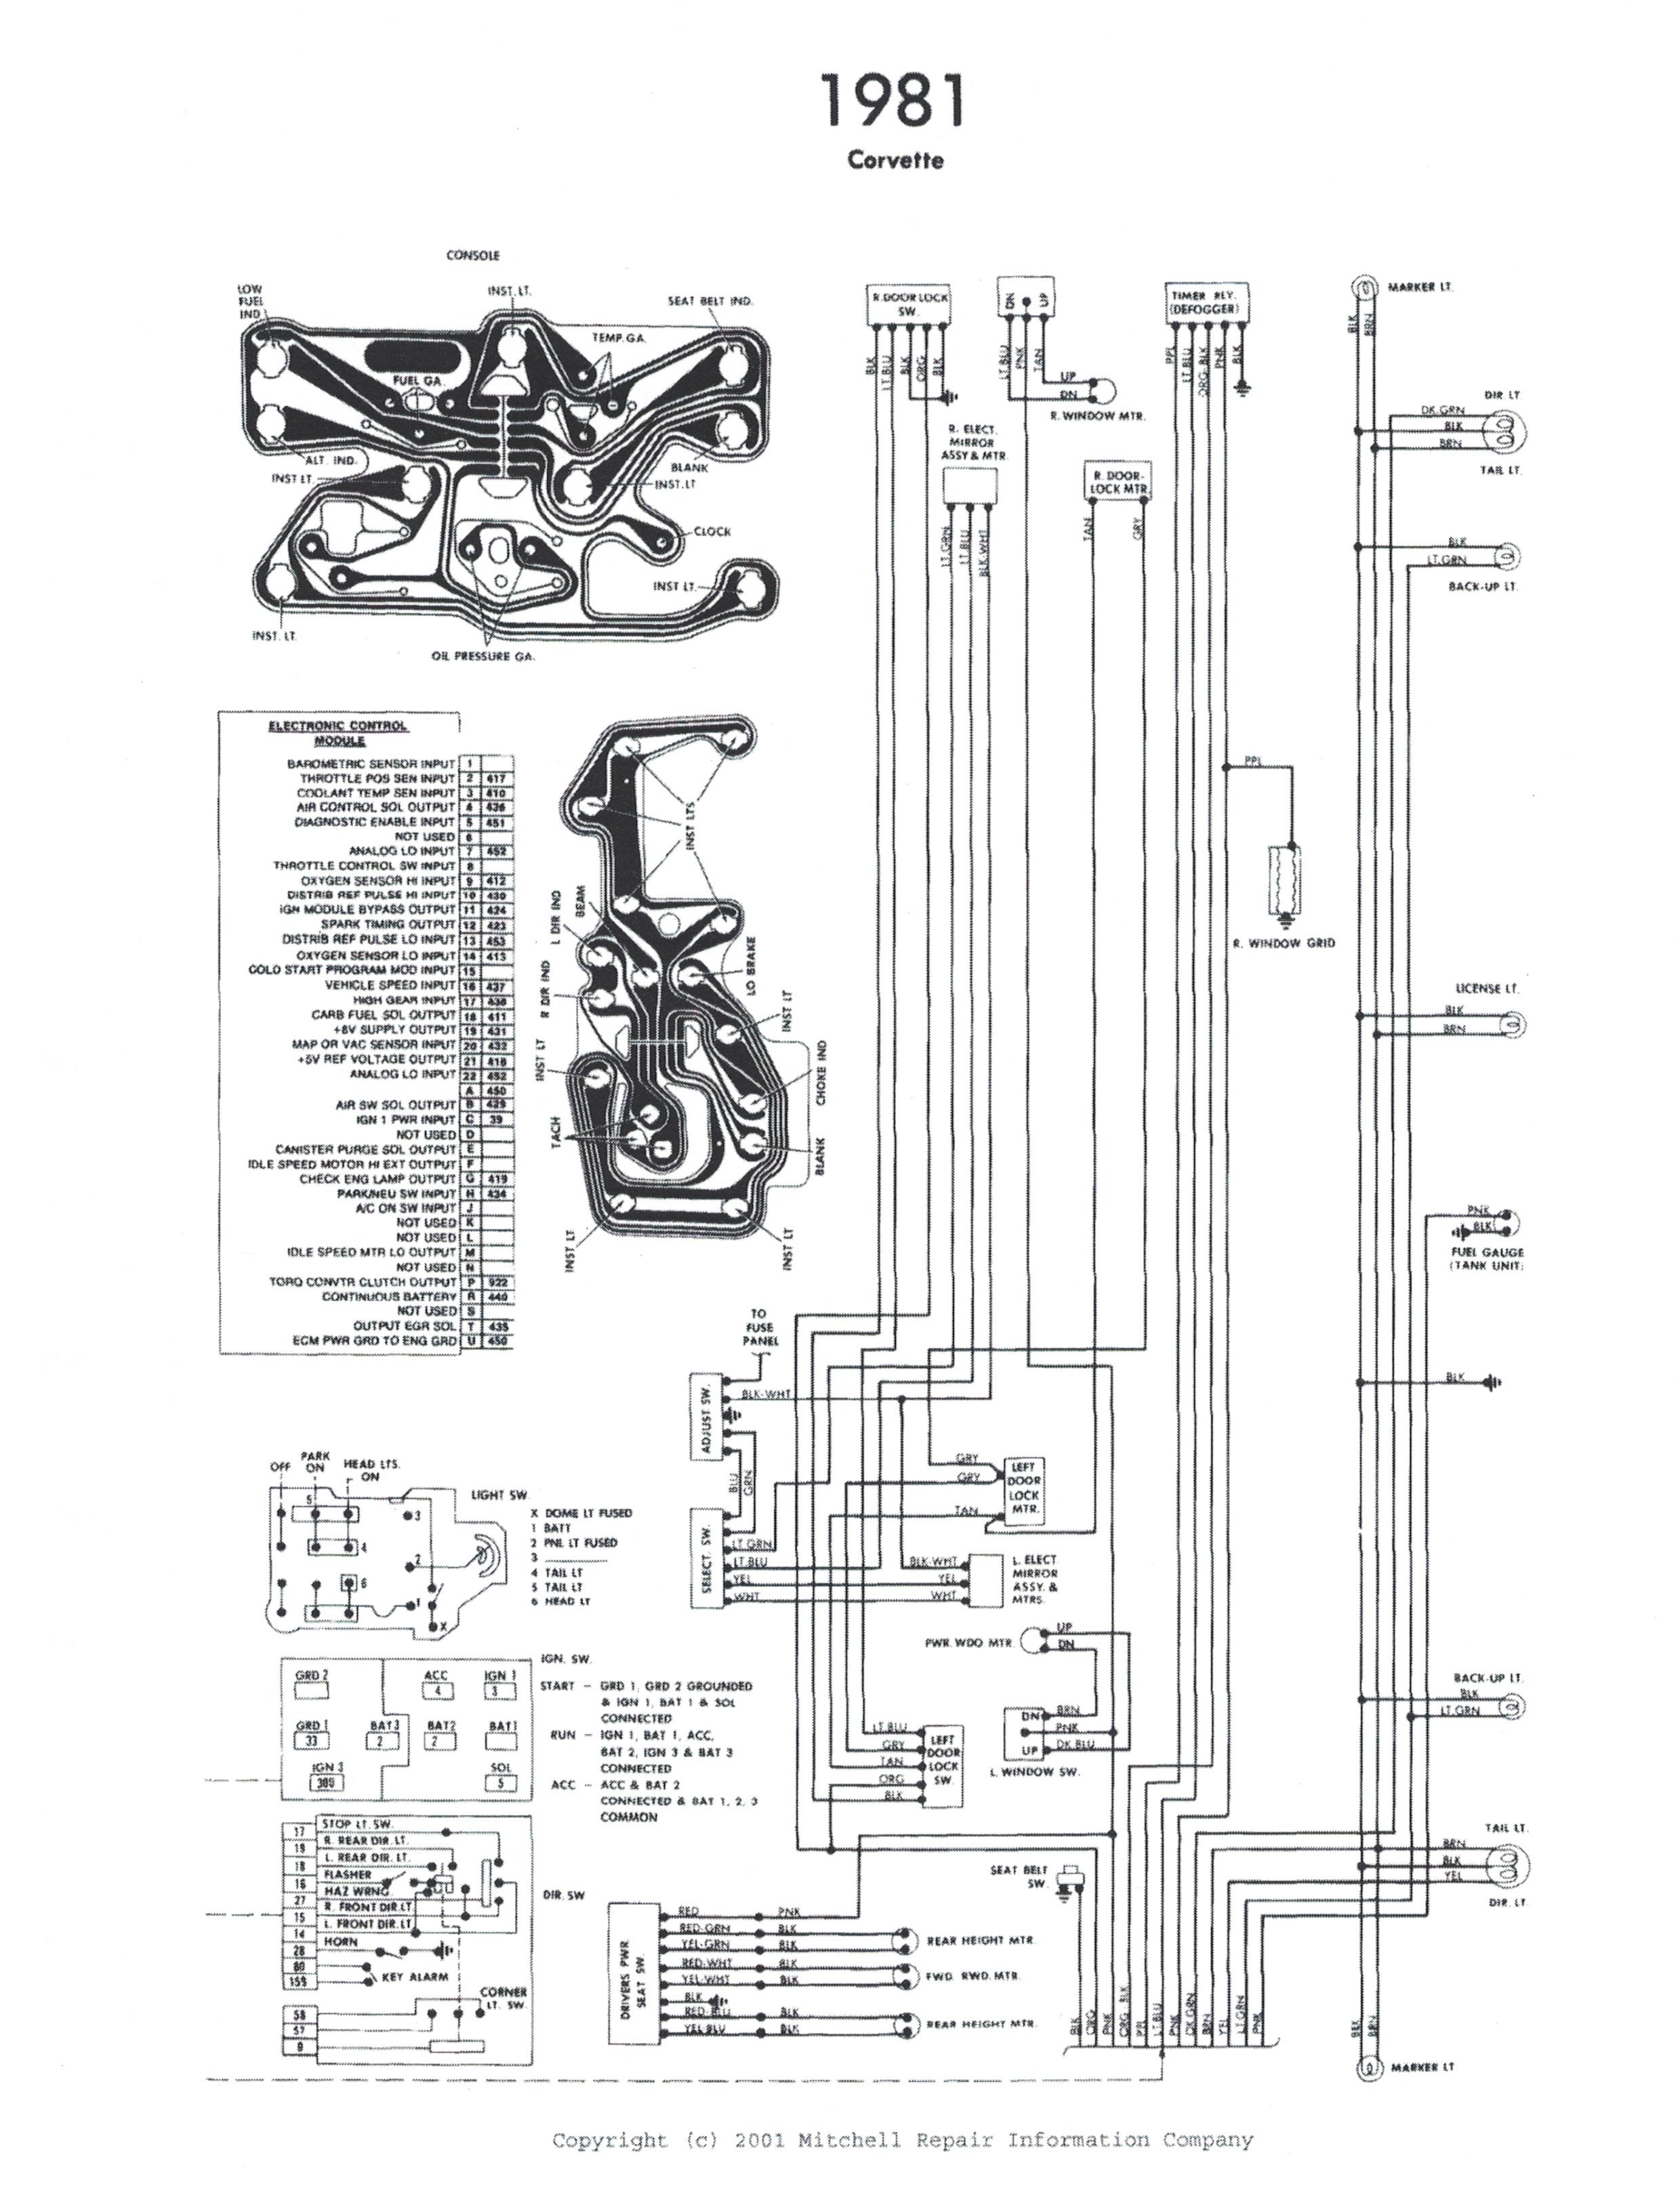 1981 Corvette Wiring Diagram Pdf